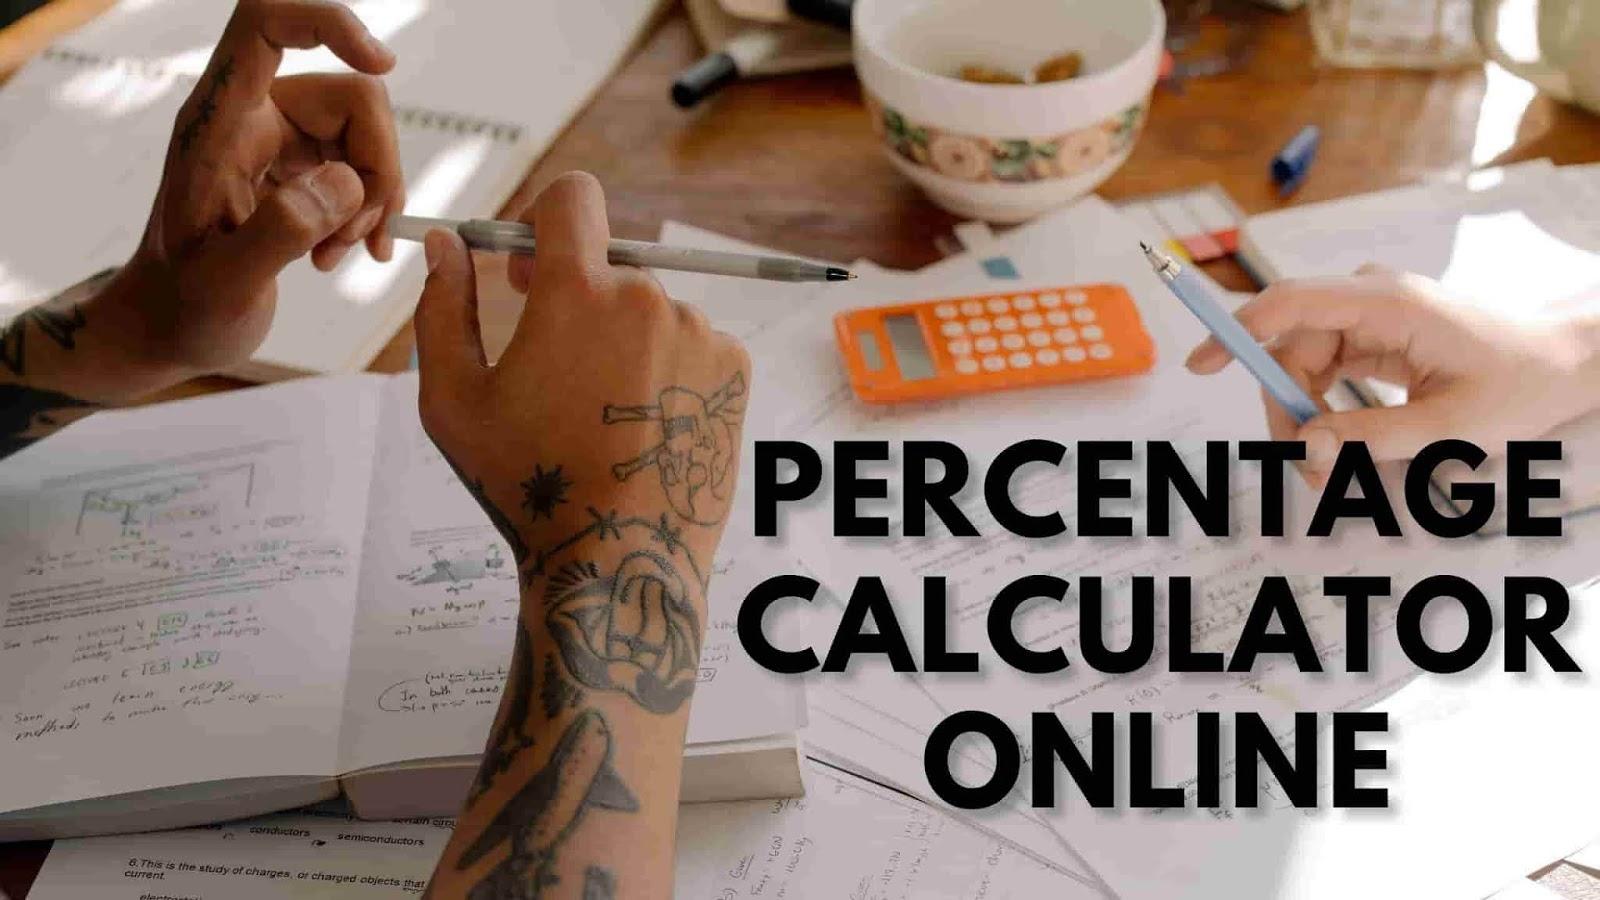 online-percentage-calculator,online-calculator-with-percentage,online-percentage-change-calculator,online-grade-calculator-with-percentage,amie-percentage-calculator-online,how-to-calculate-percentage-online-calculator,free-online-percentage-calculator,online-percentage-calculator-of-marks,online-percentage-calculator-between-two-numbers